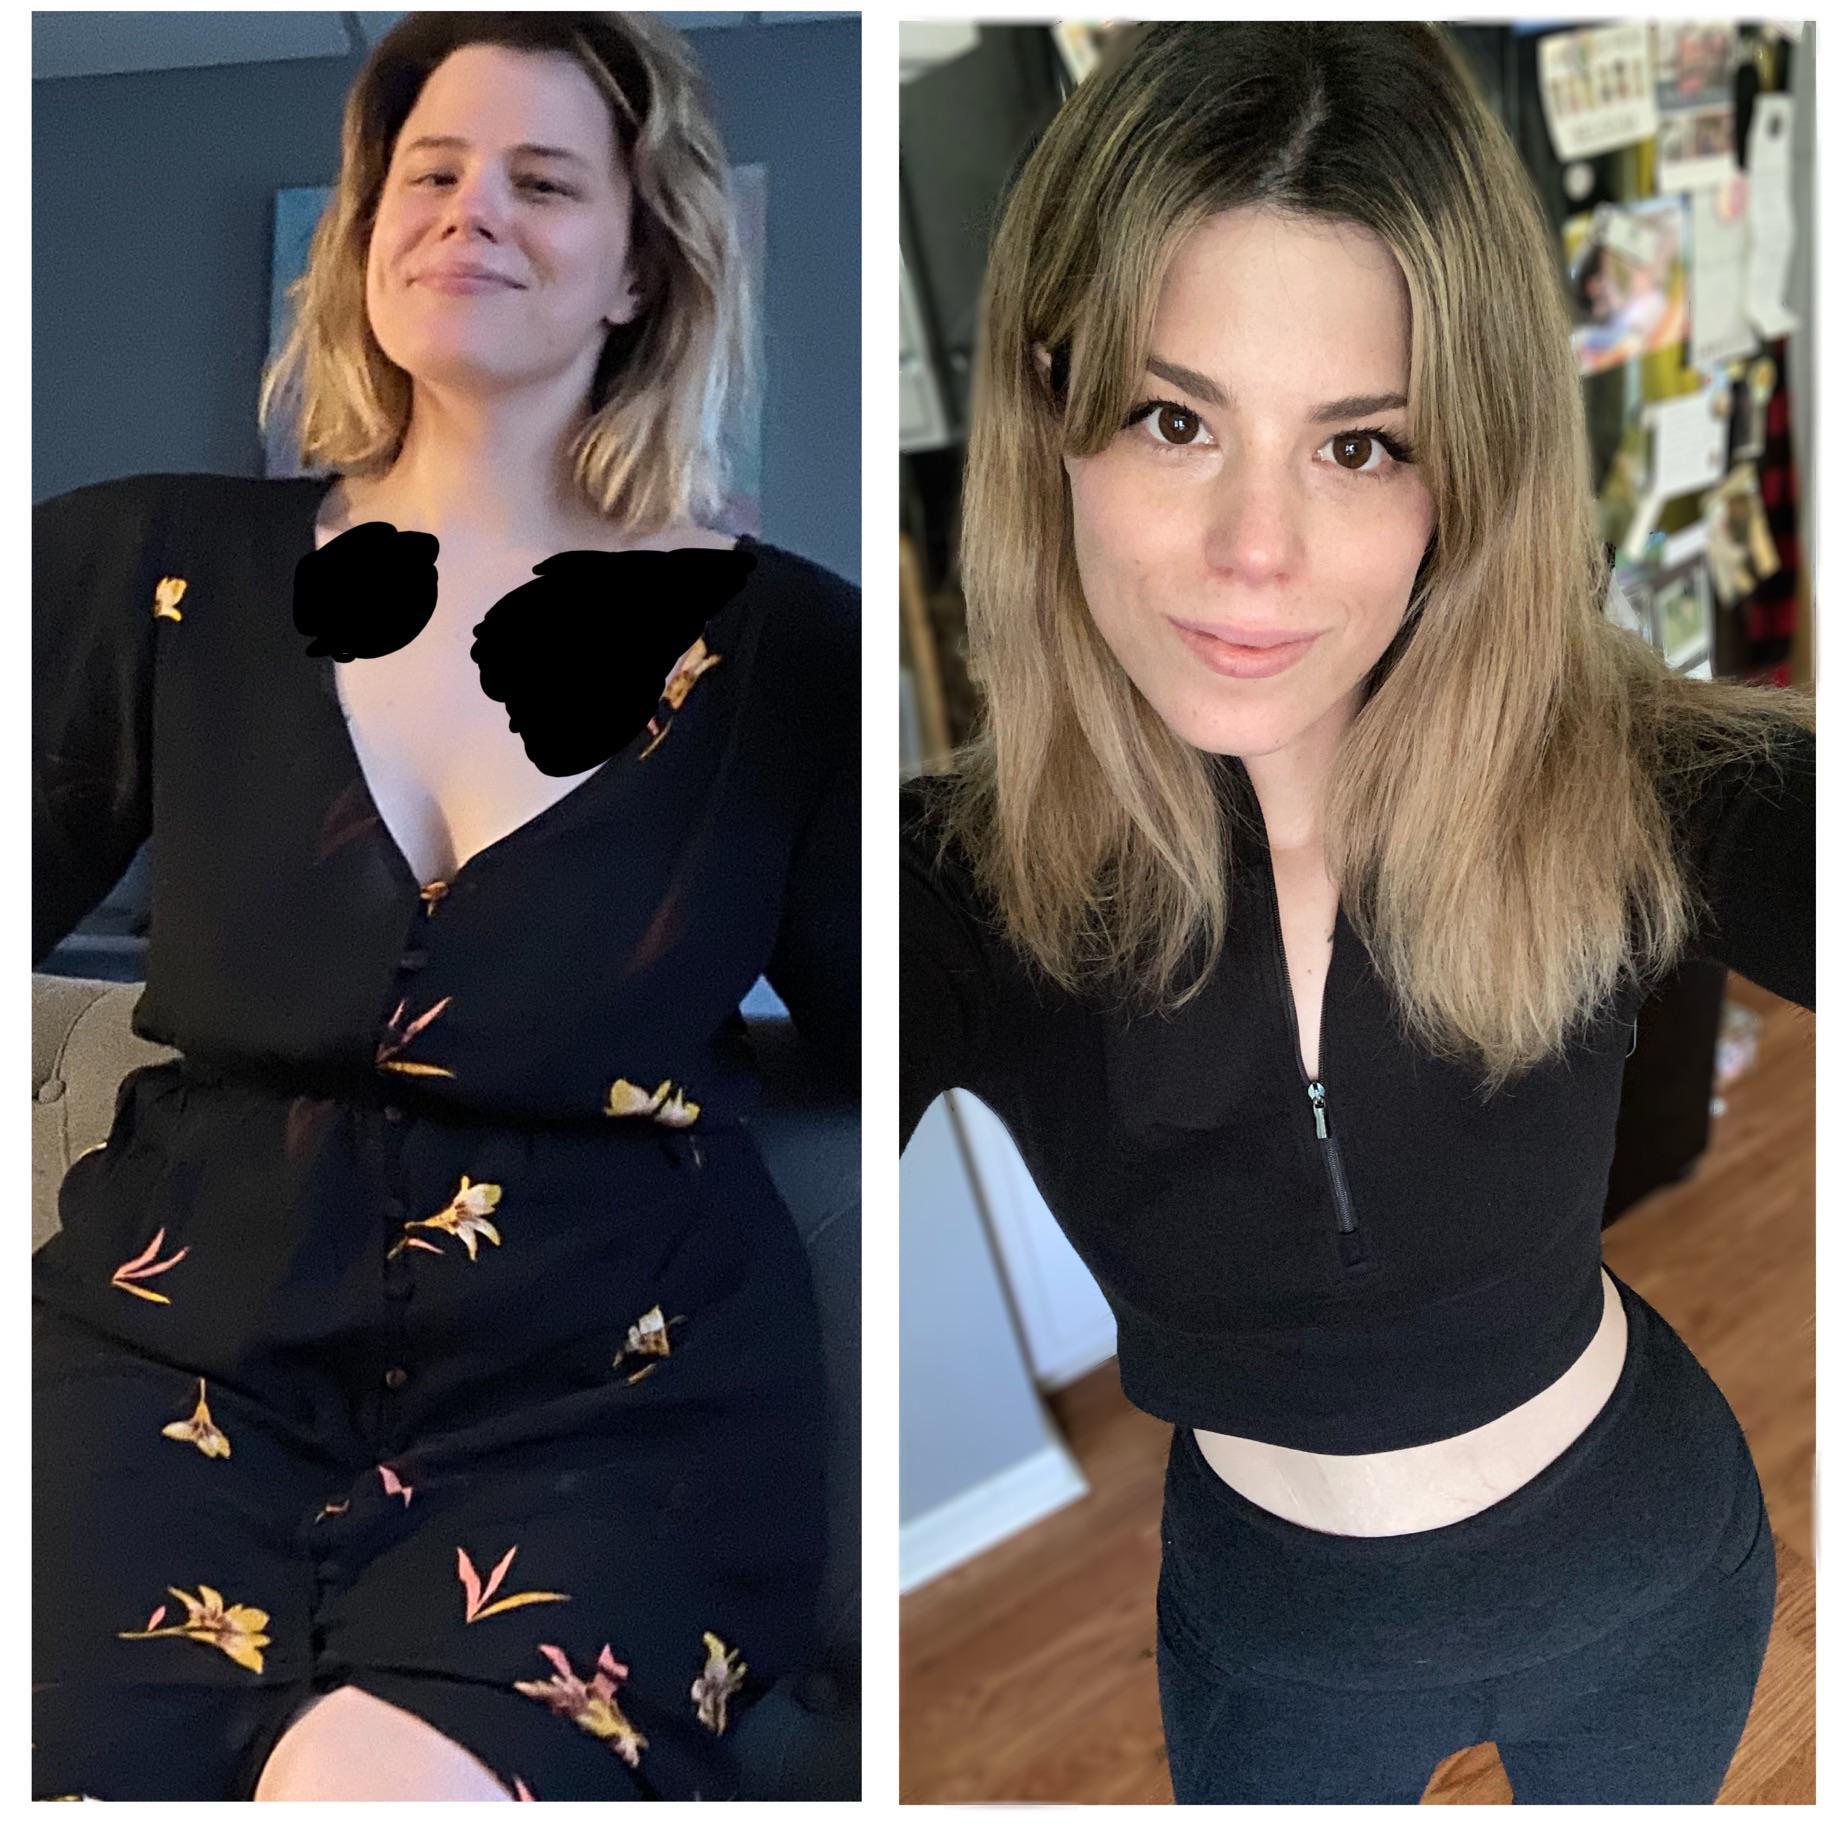 5 foot 5 Female Progress Pics of 50 lbs Weight Loss 170 lbs to 120 lbs